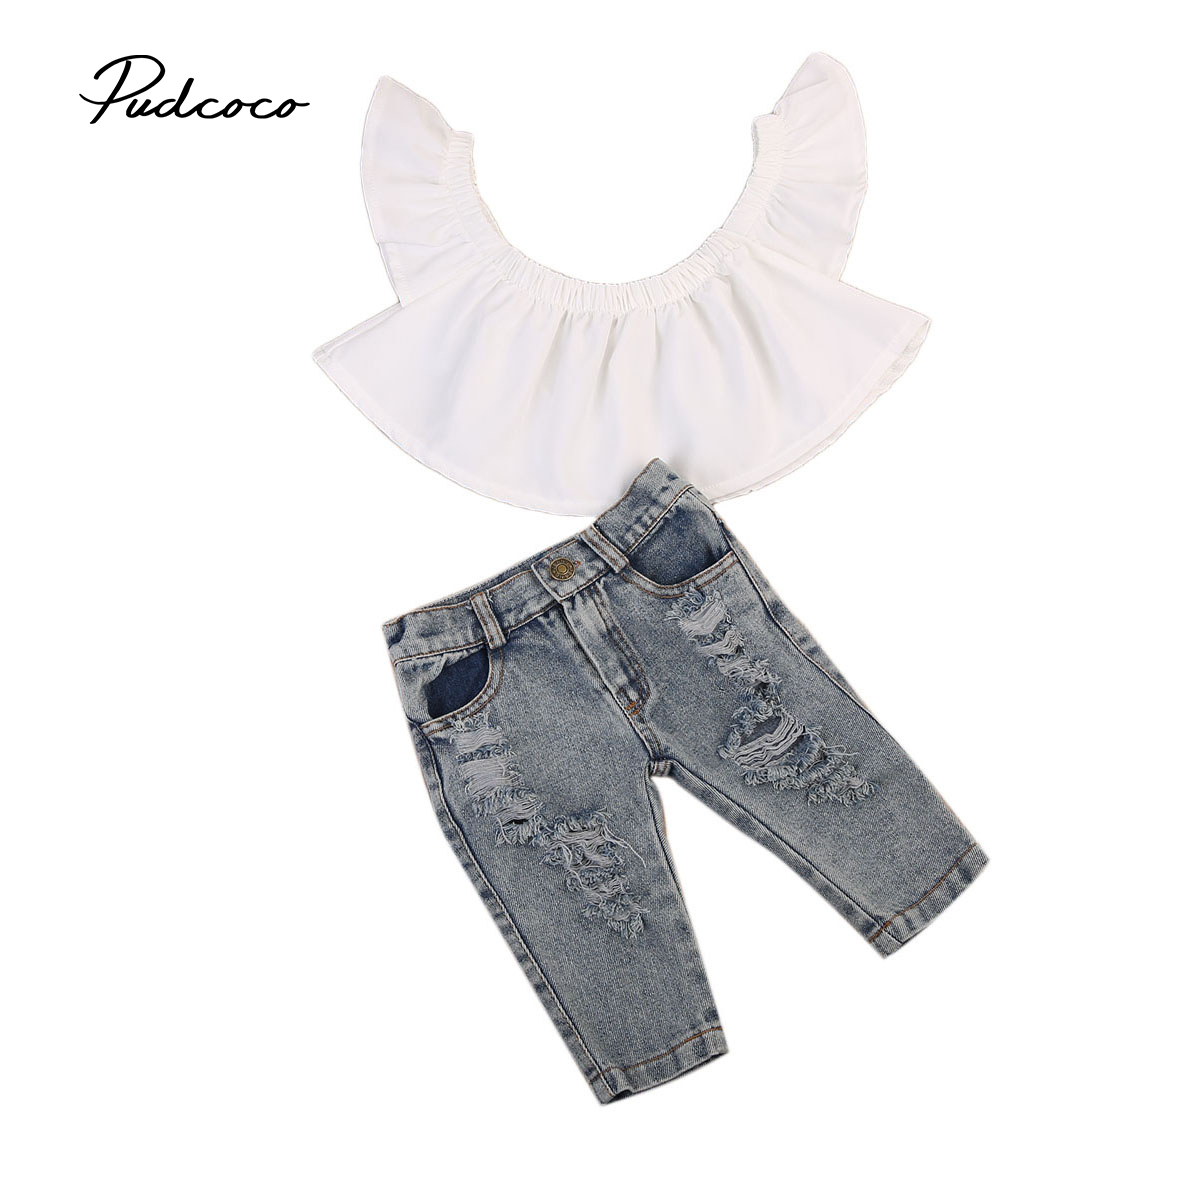 2017 Brand New Toddler Infant Kids Baby Girls Flutter Off Shoulder Tops Holes Denim Pants 2Pcs Outfits Fashion Clothes 6M-4T